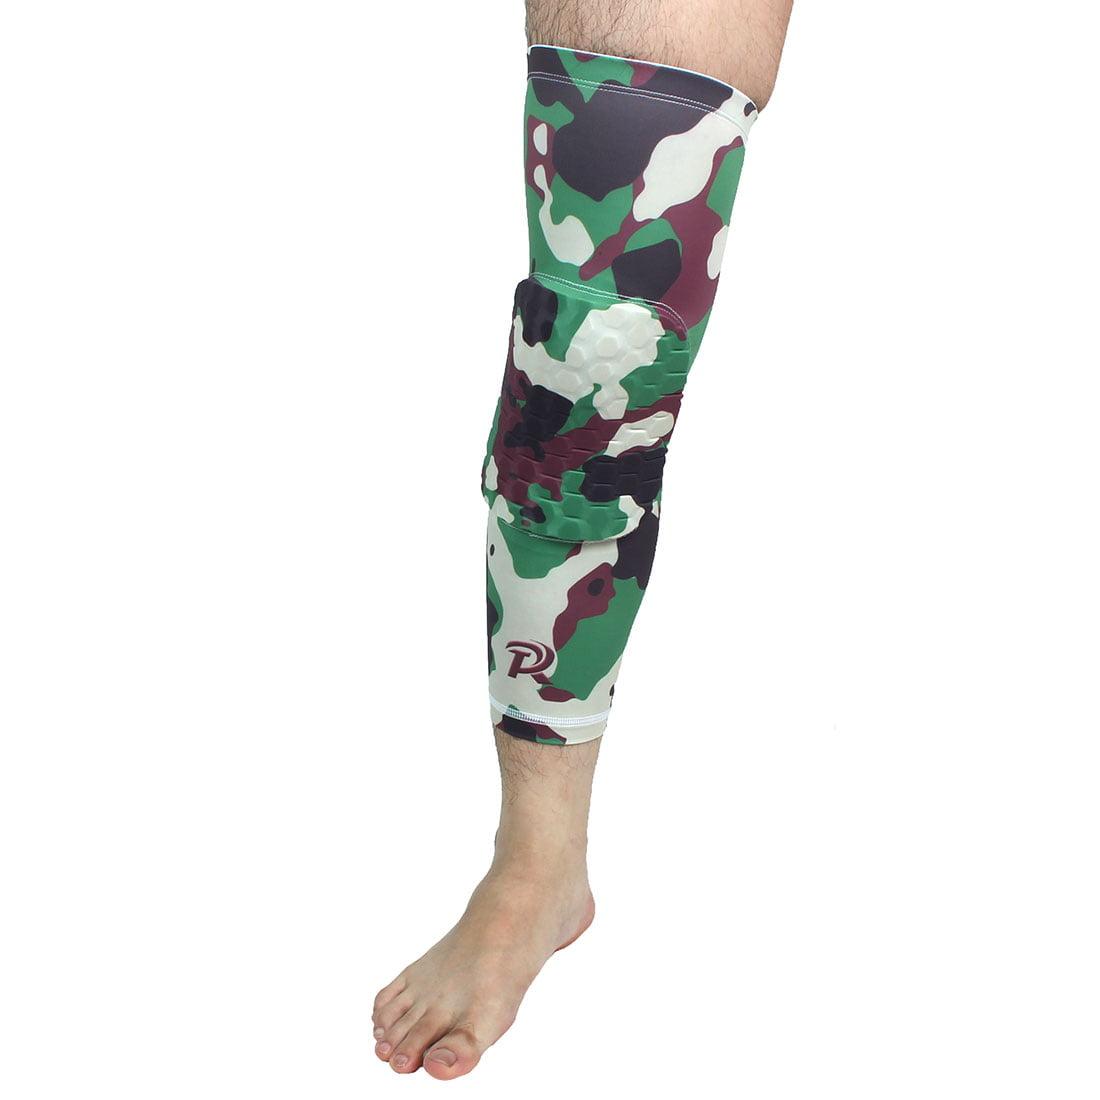 Basketball Patella Knee Brace Leg Sleeve Wrap Support Camouflage Green XL Pair - image 5 de 6